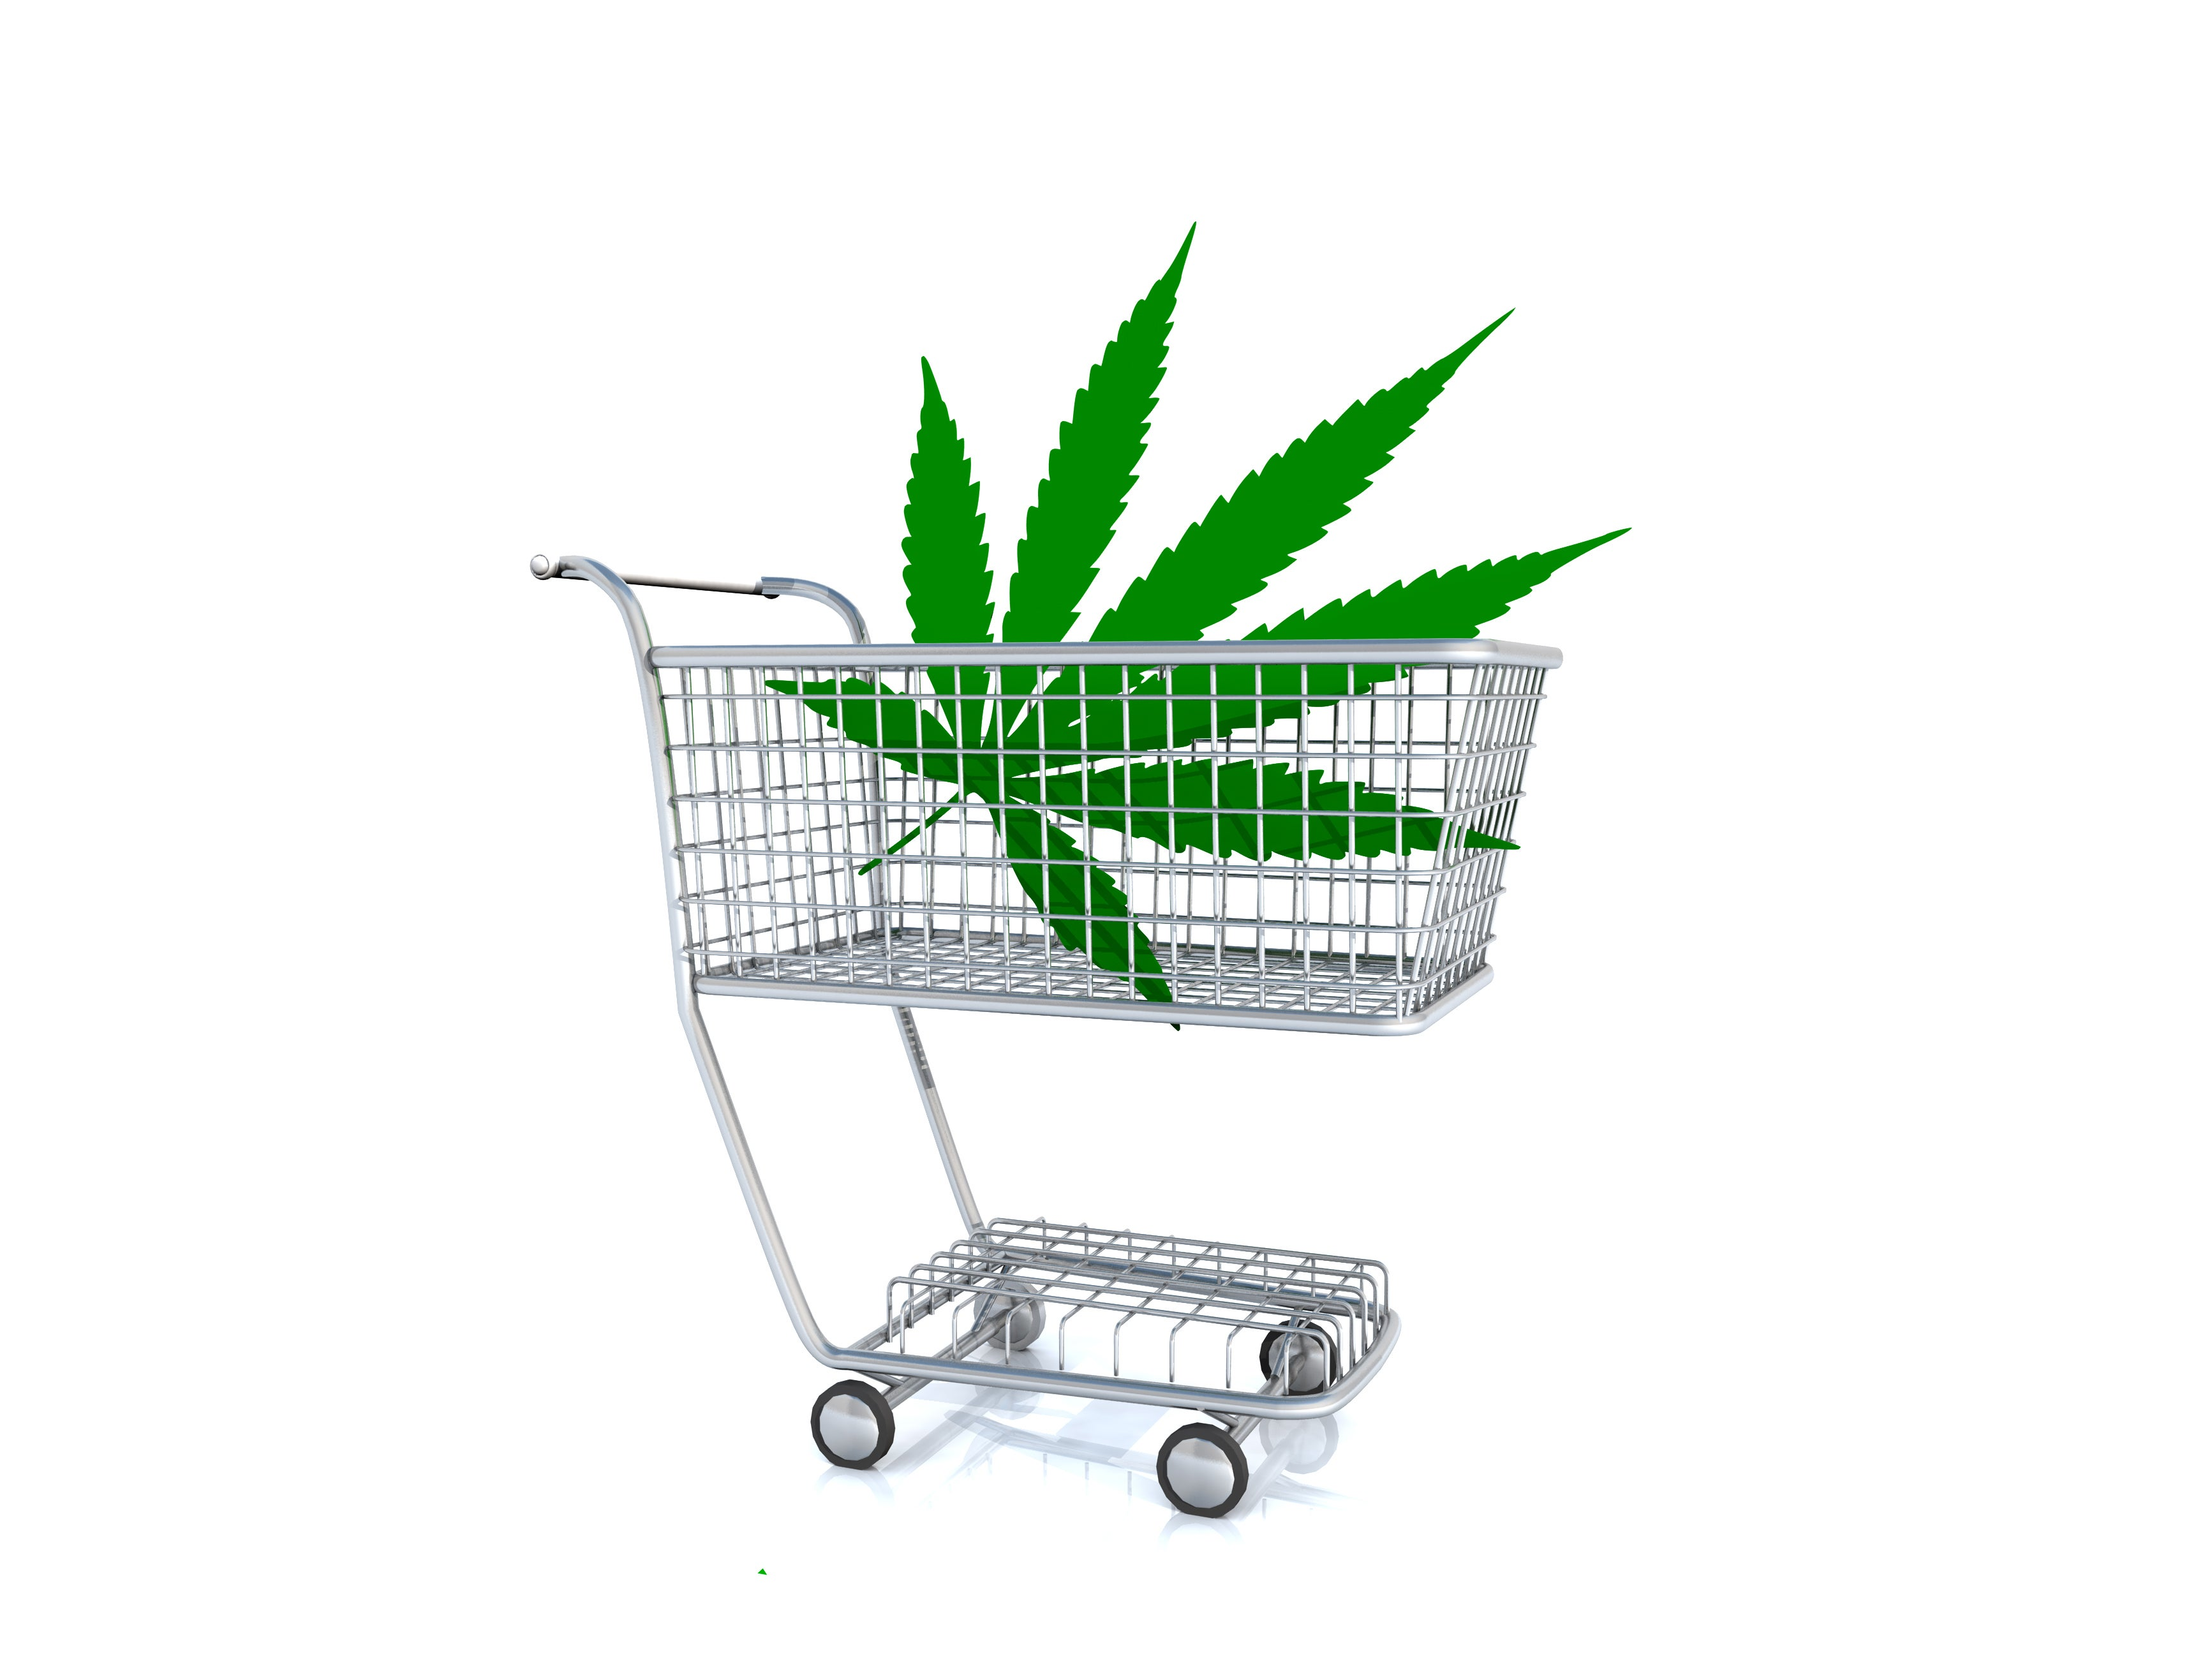 Better Marijuana Stock: Aurora Cannabis vs. Cronos Group | The Motley Fool